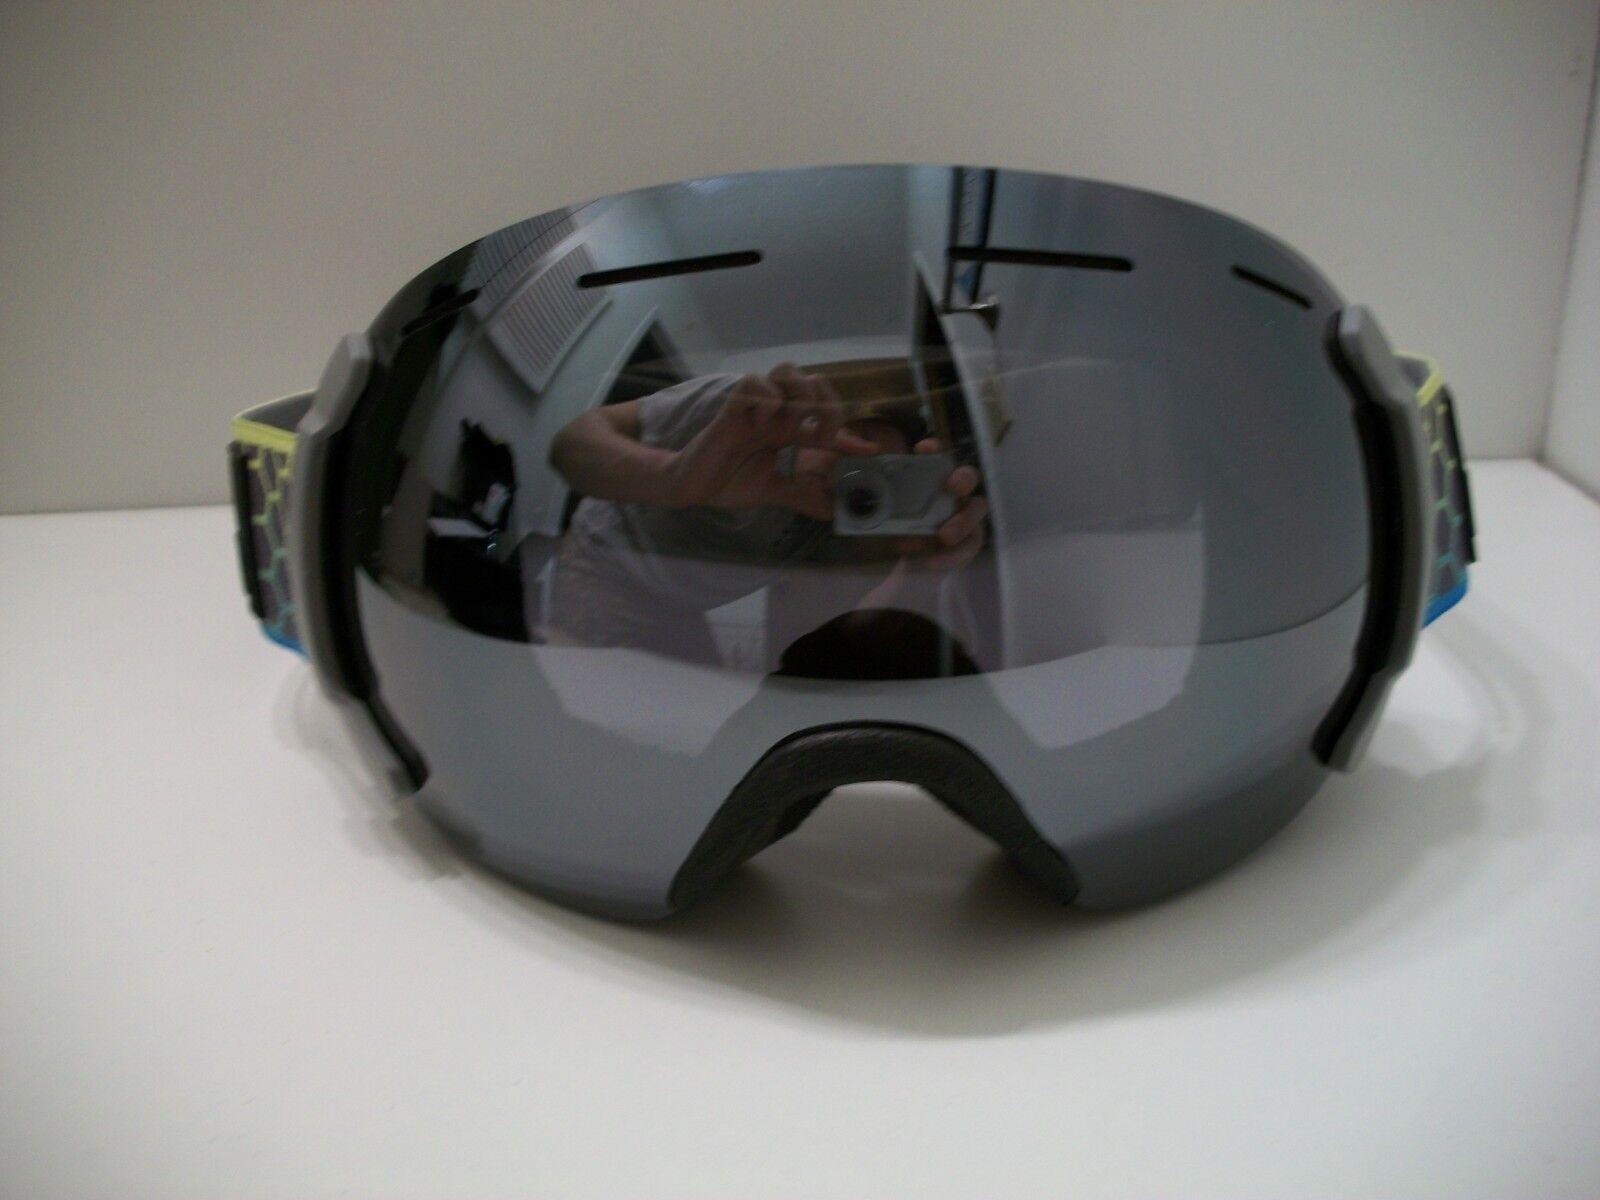 Bern Eastwood Cyan Lime Fade Ski Snow Board Goggles L Frame Read Entire Post